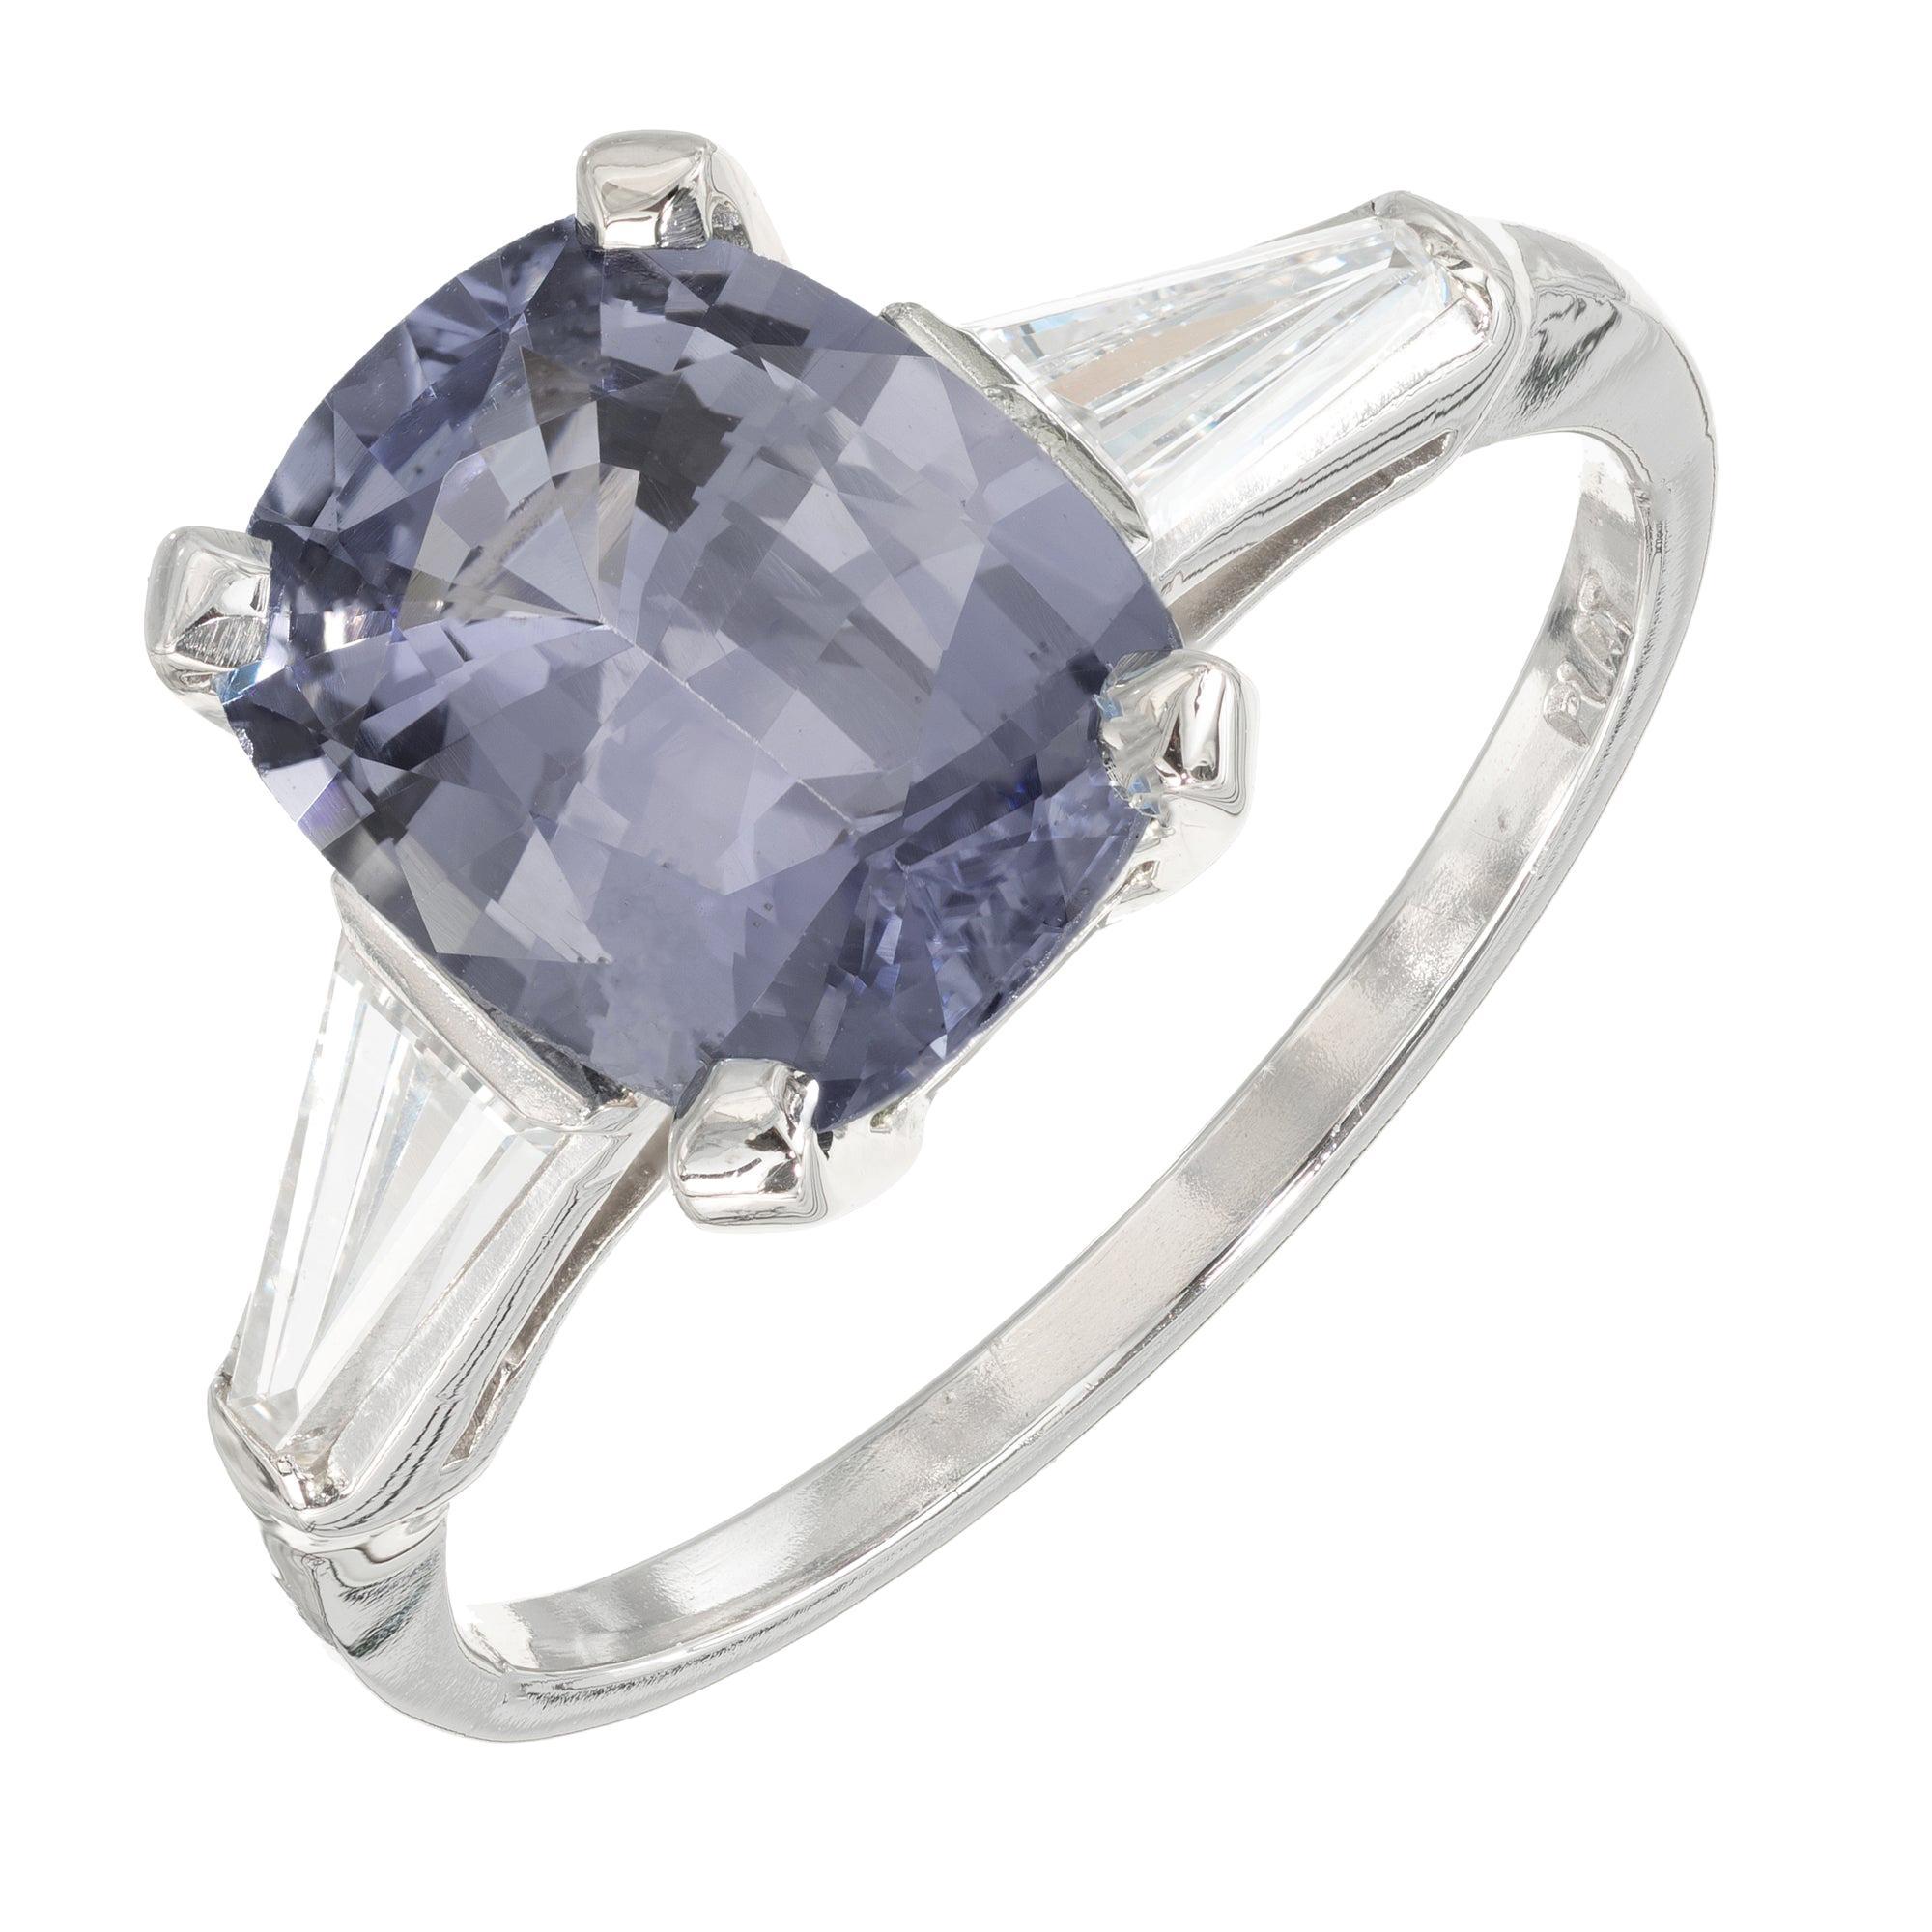 GIA Certified 3.06 Carat Ceylon Oval Sapphire Diamond Platinum Engagement Ring